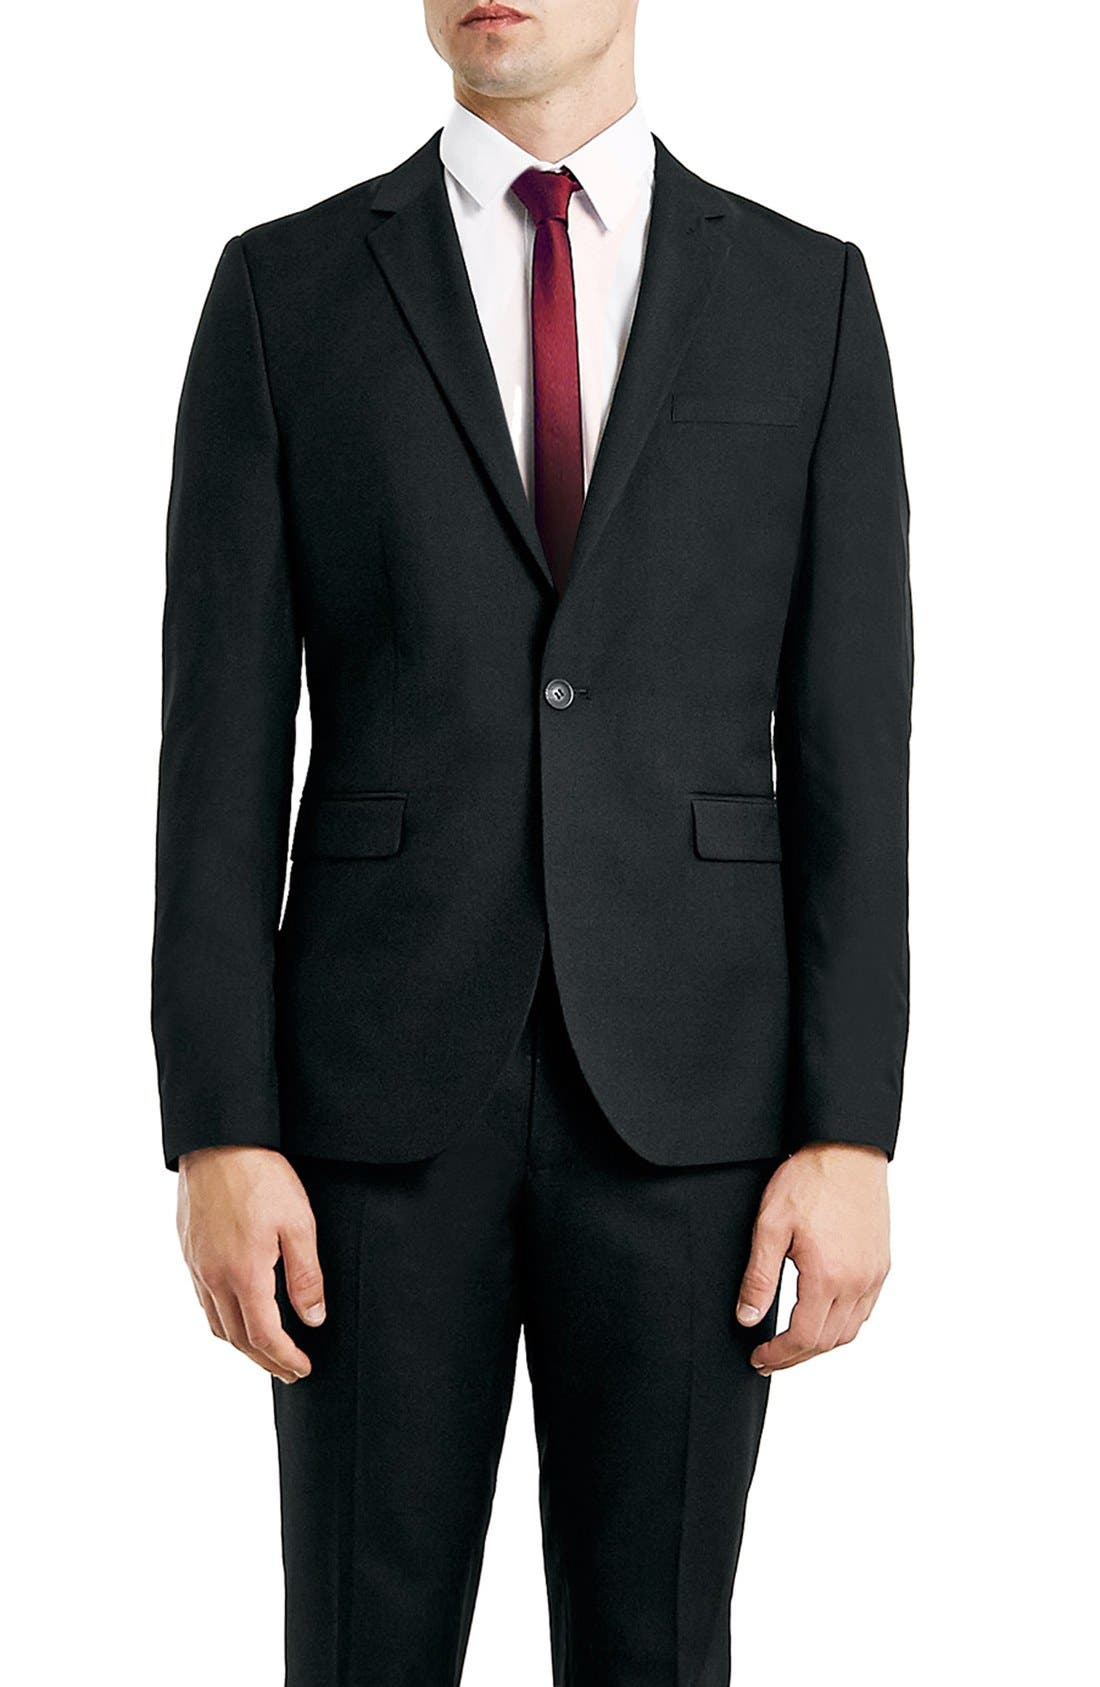 Topman Skinny Fit Black One-Button Suit Jacket